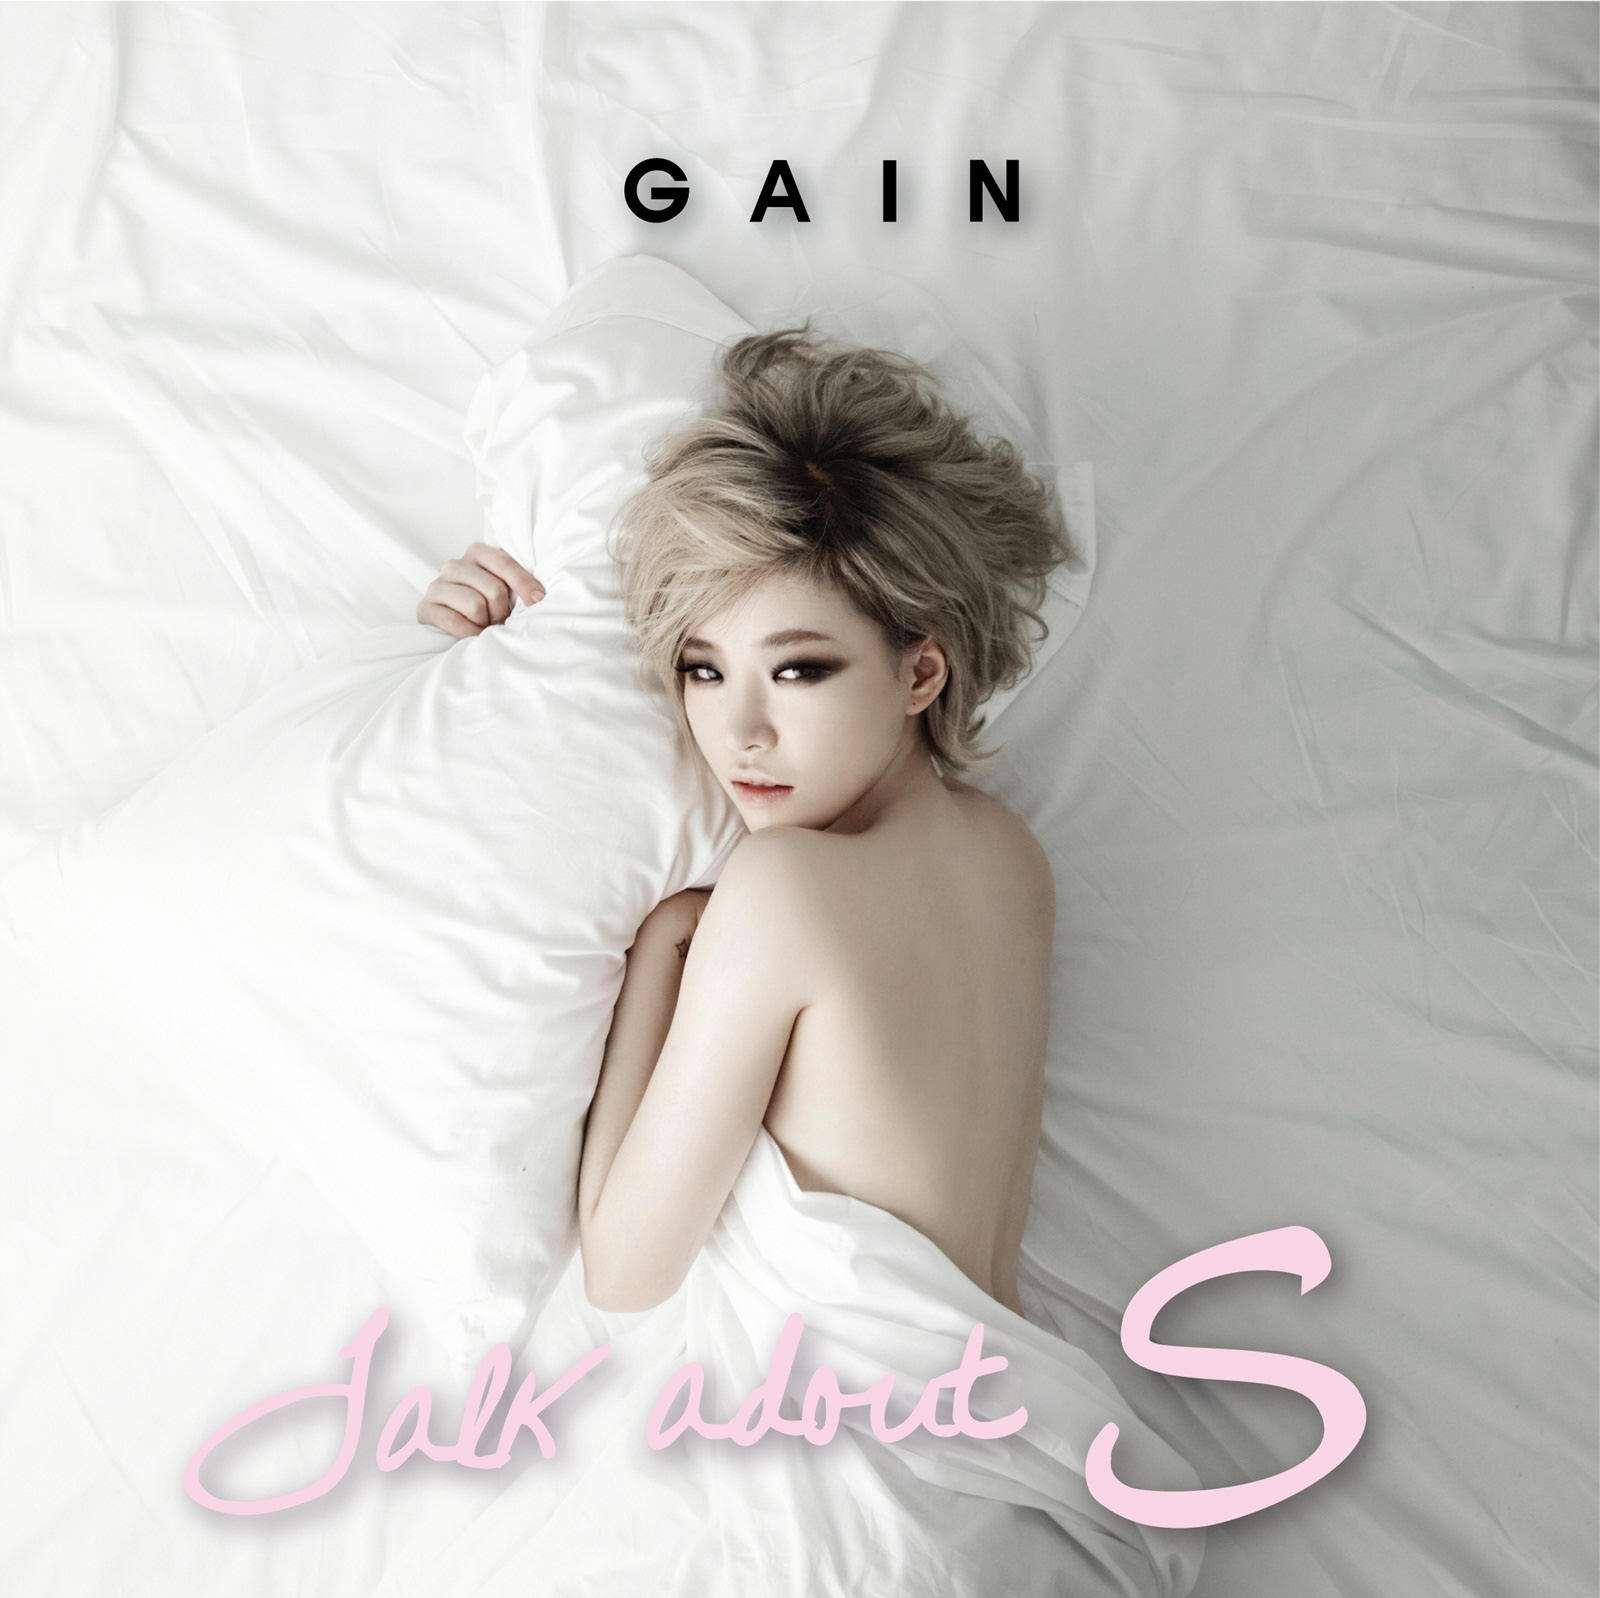 [Mini Album] GaIn - Talk About S.